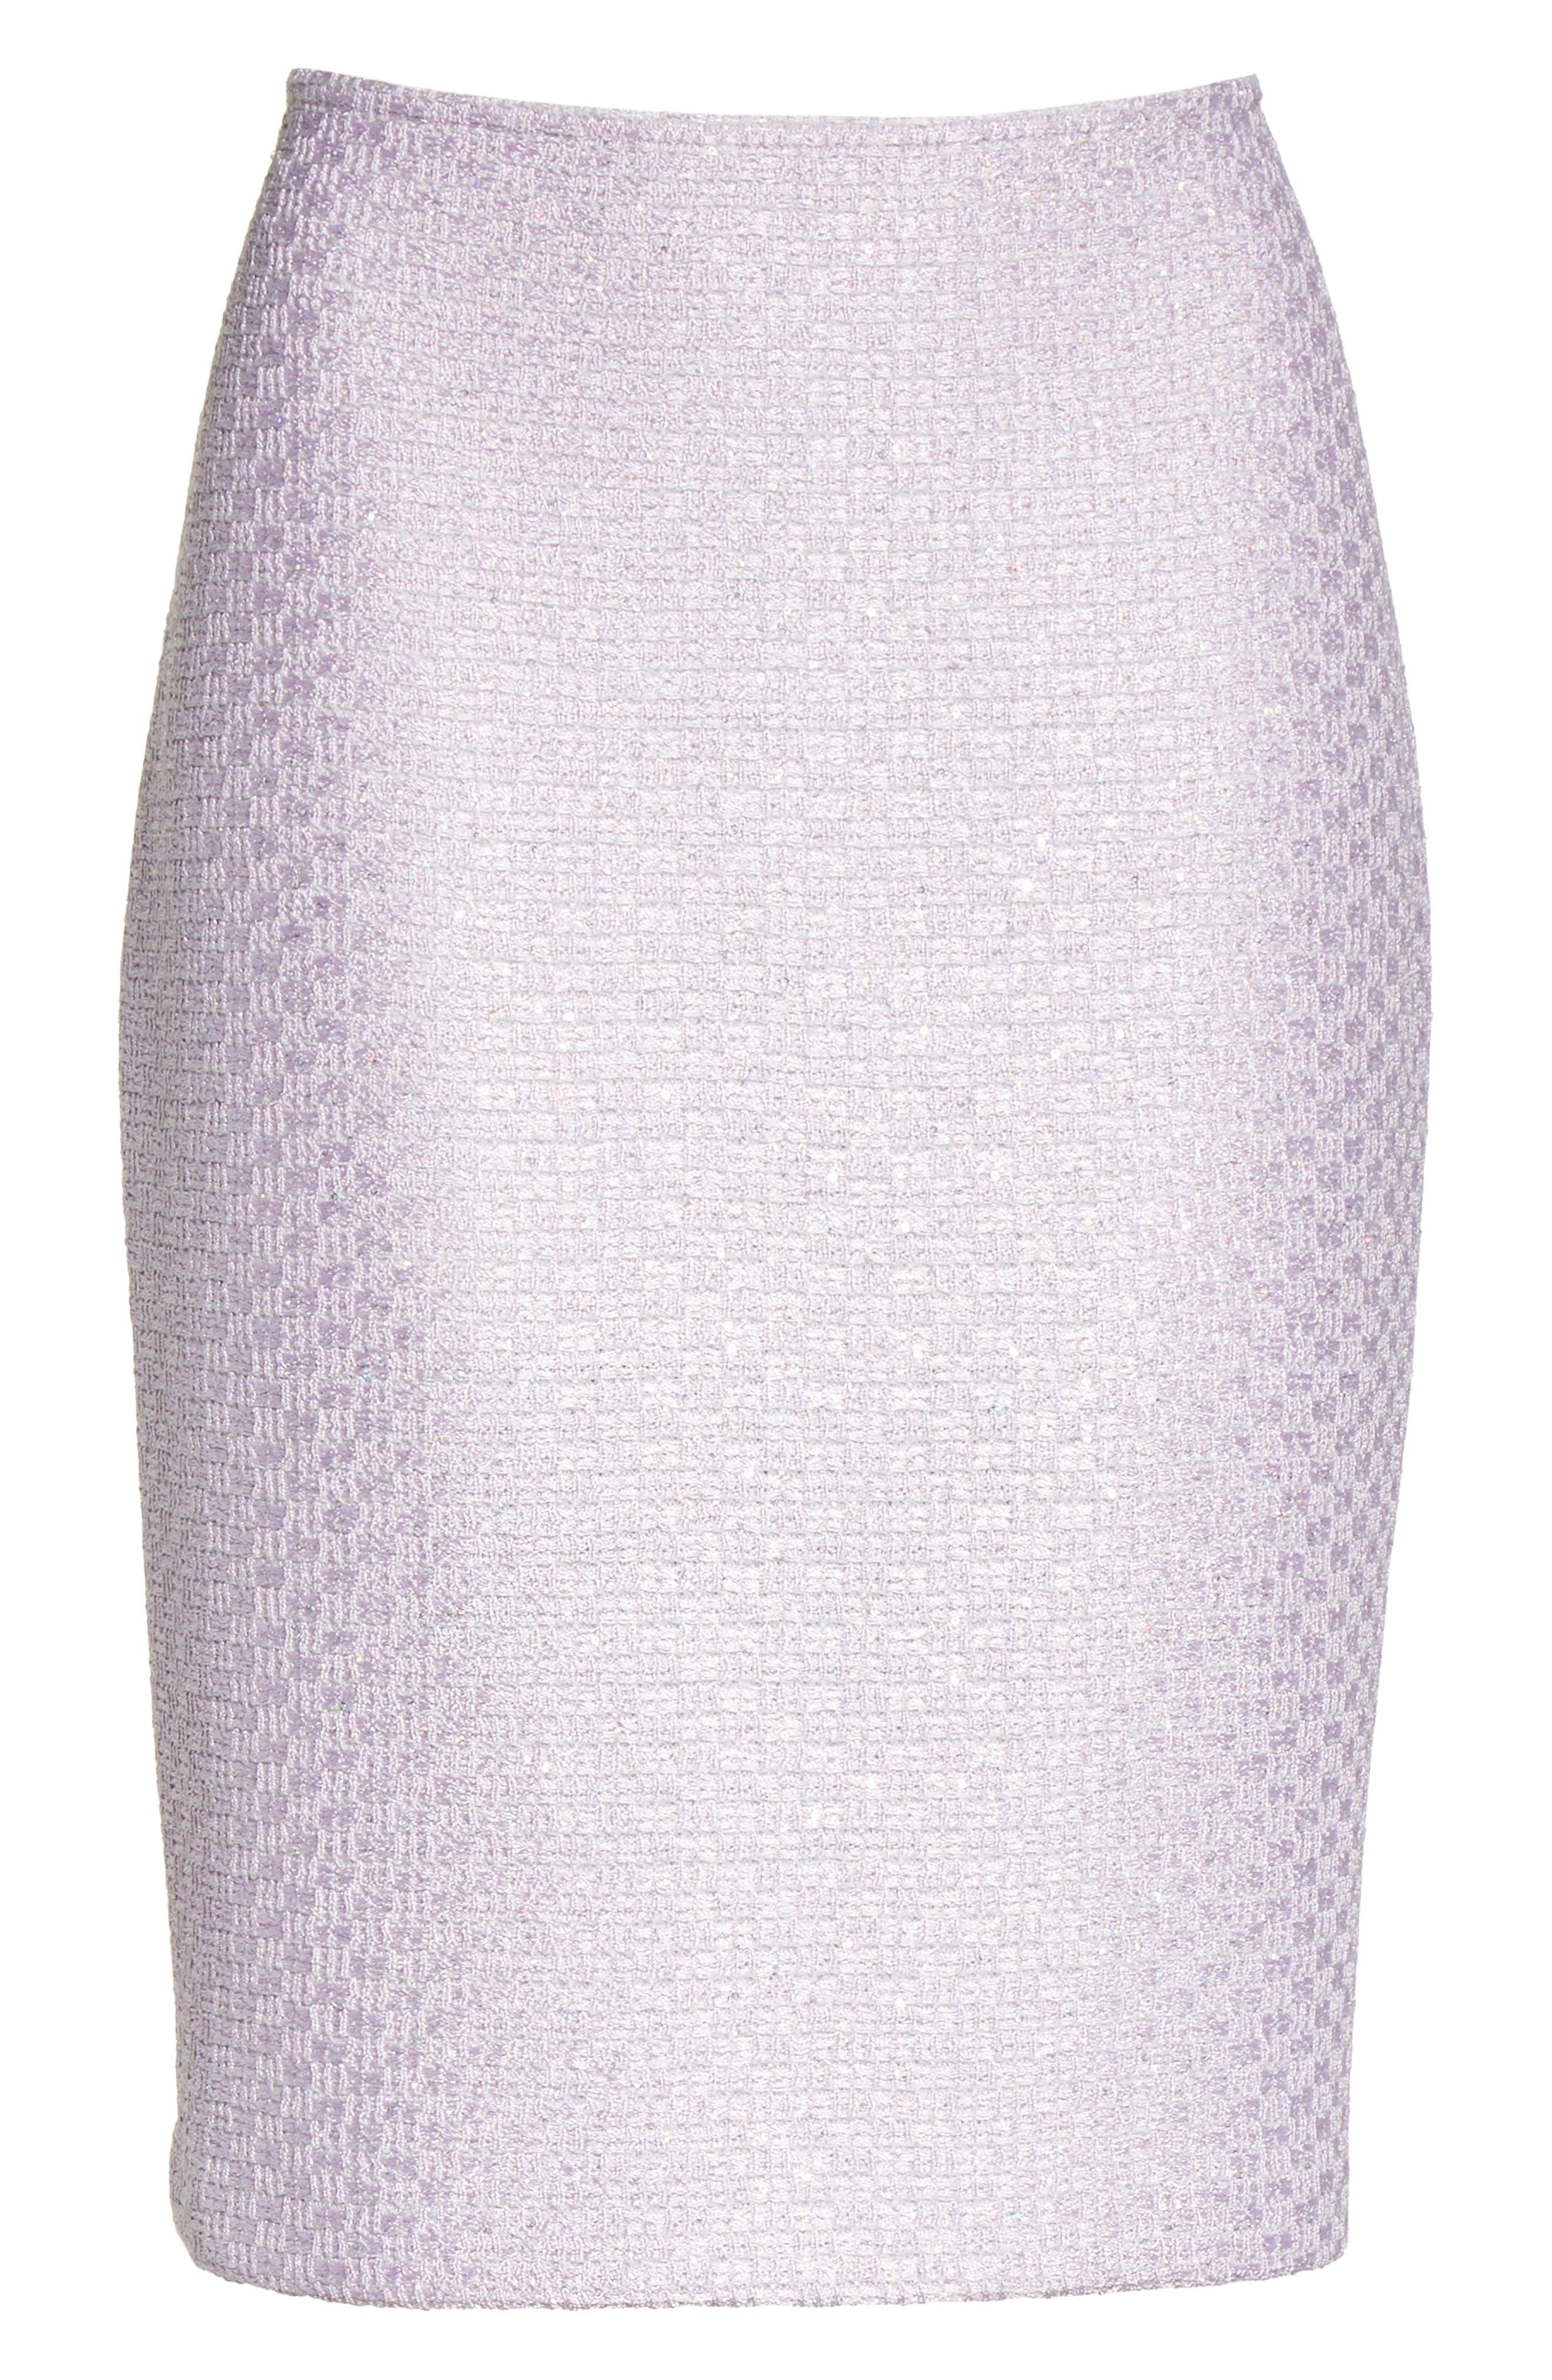 Hansh Sequin Knit Pencil Skirt,                             Alternate thumbnail 6, color,